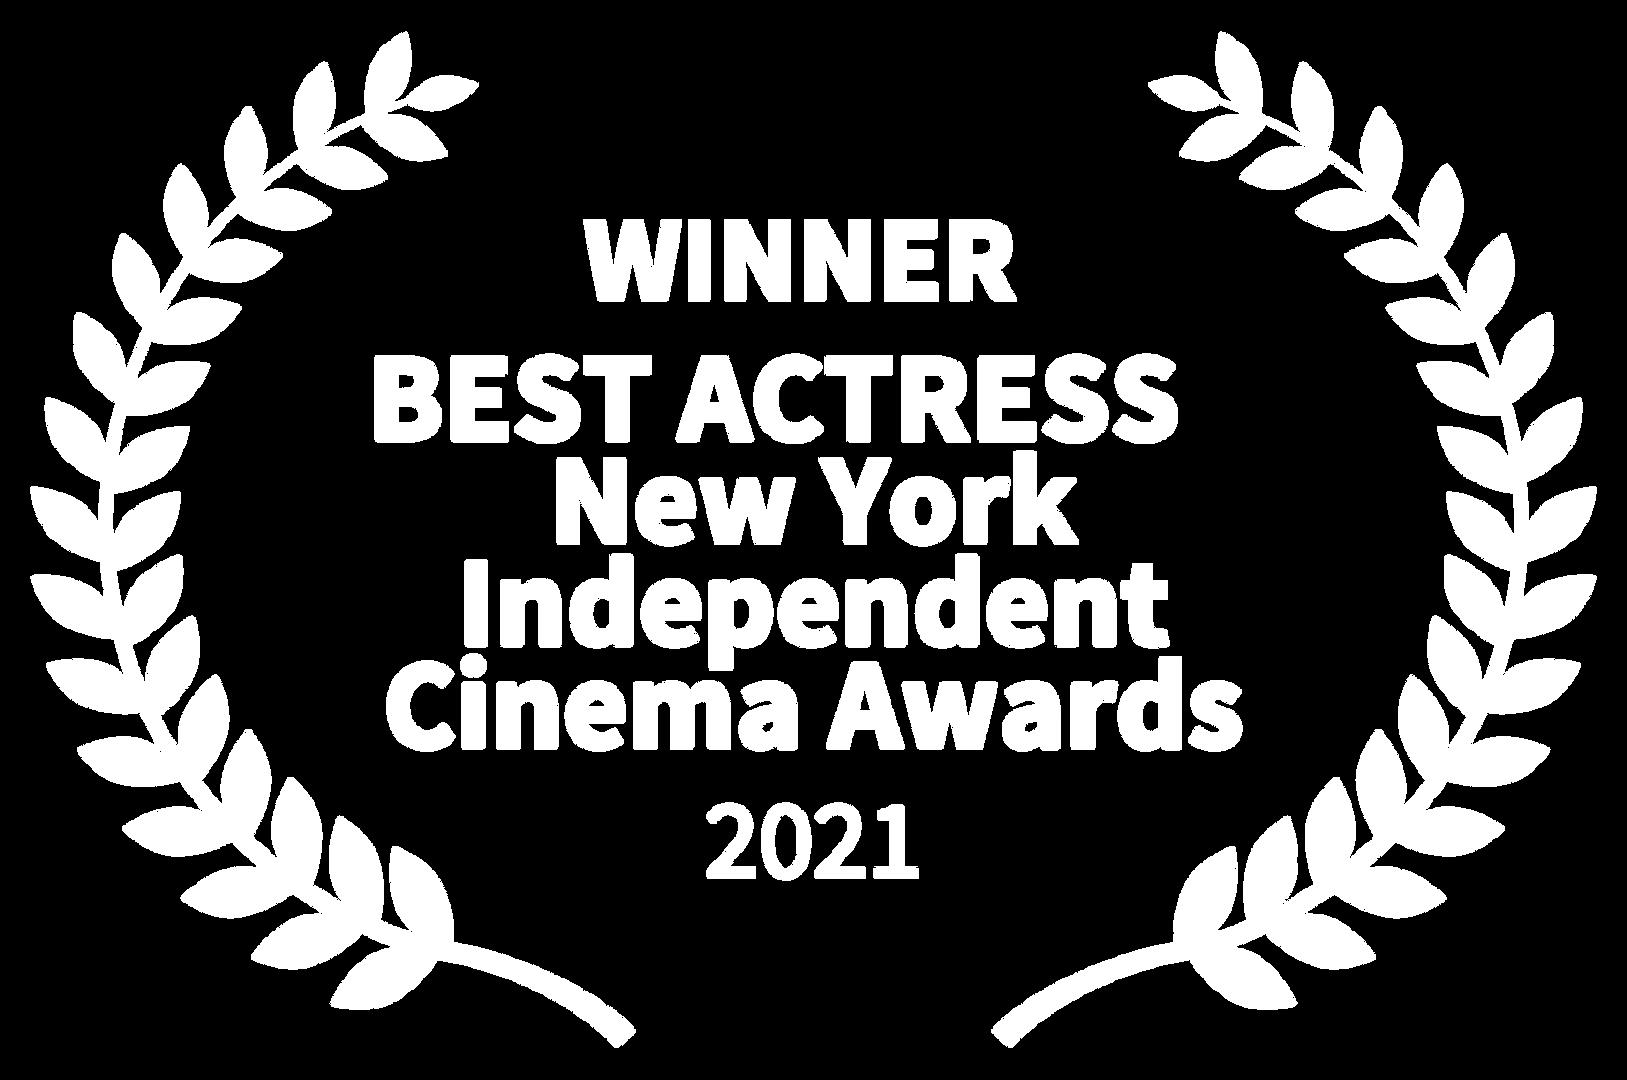 WINNER - BEST ACTRESS New York Independe